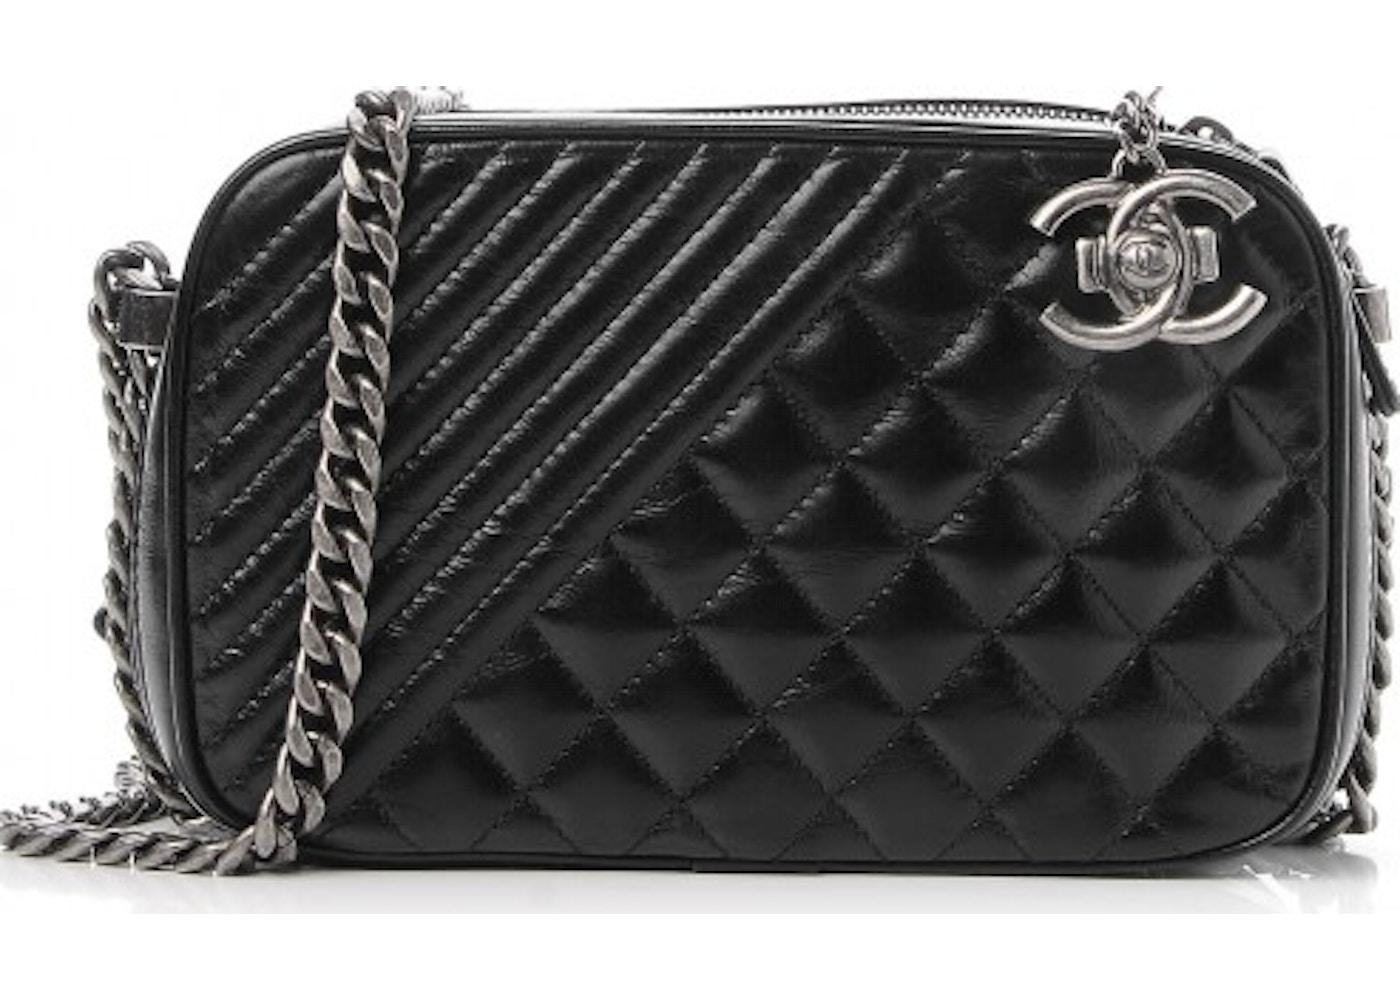 dcd171627c6c Chanel Coco Boy Camera Case Quilted Diagonal/Diamond Glazed ...